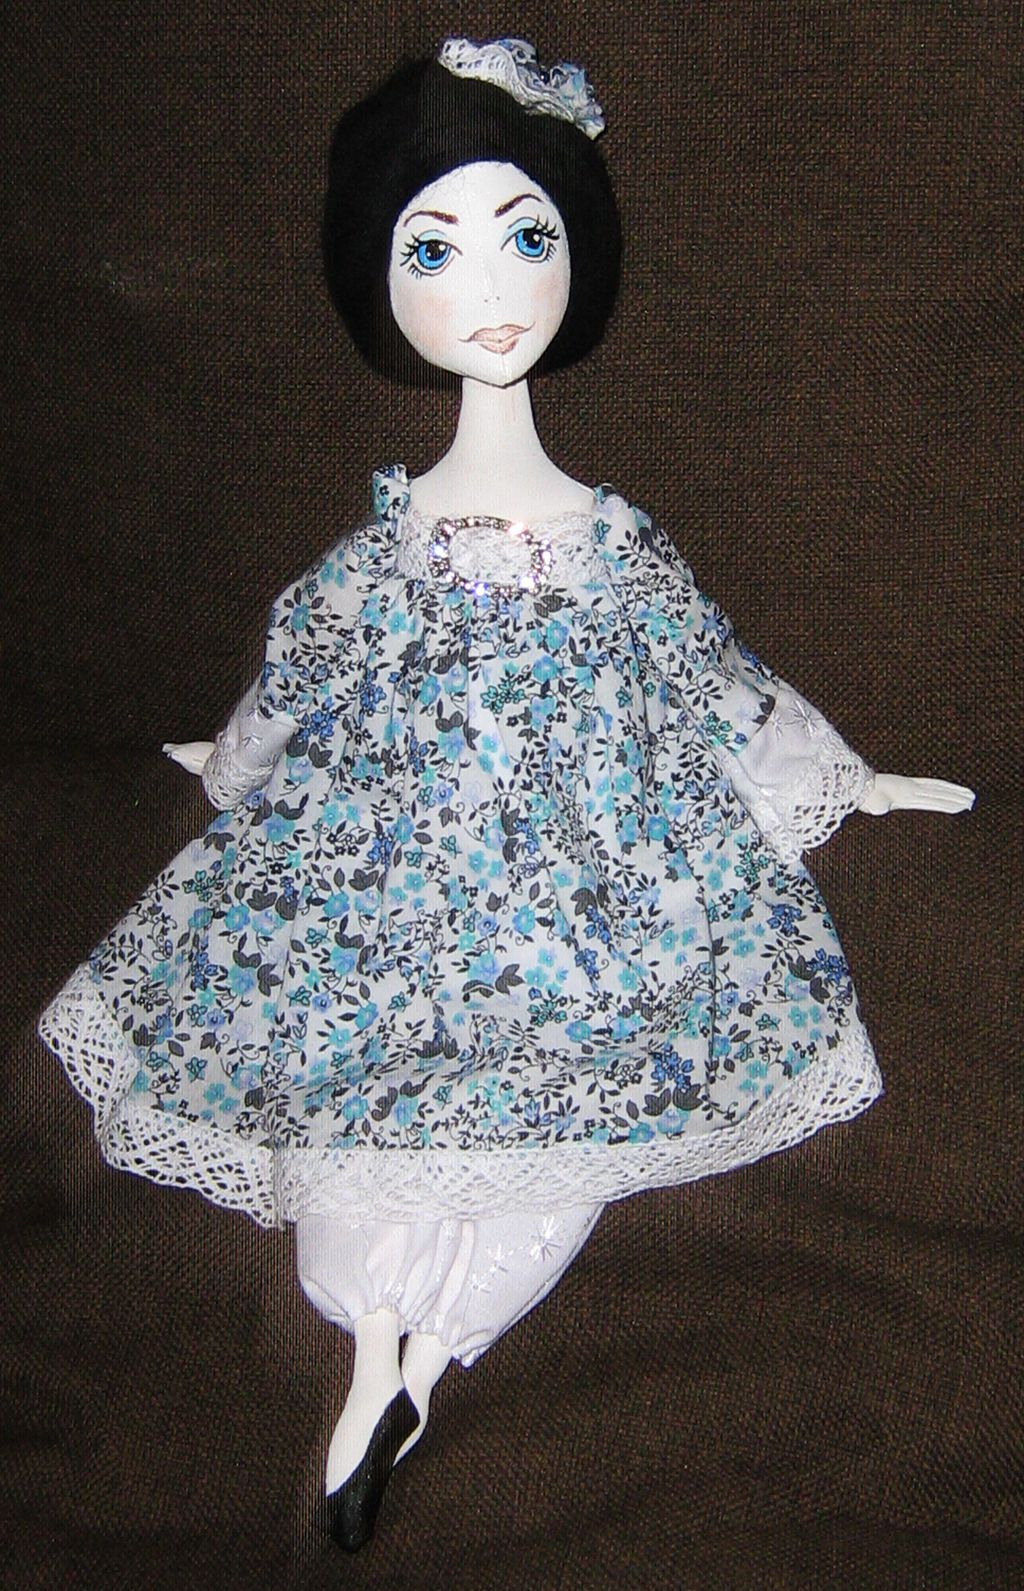 doll interior vintage textile handmade